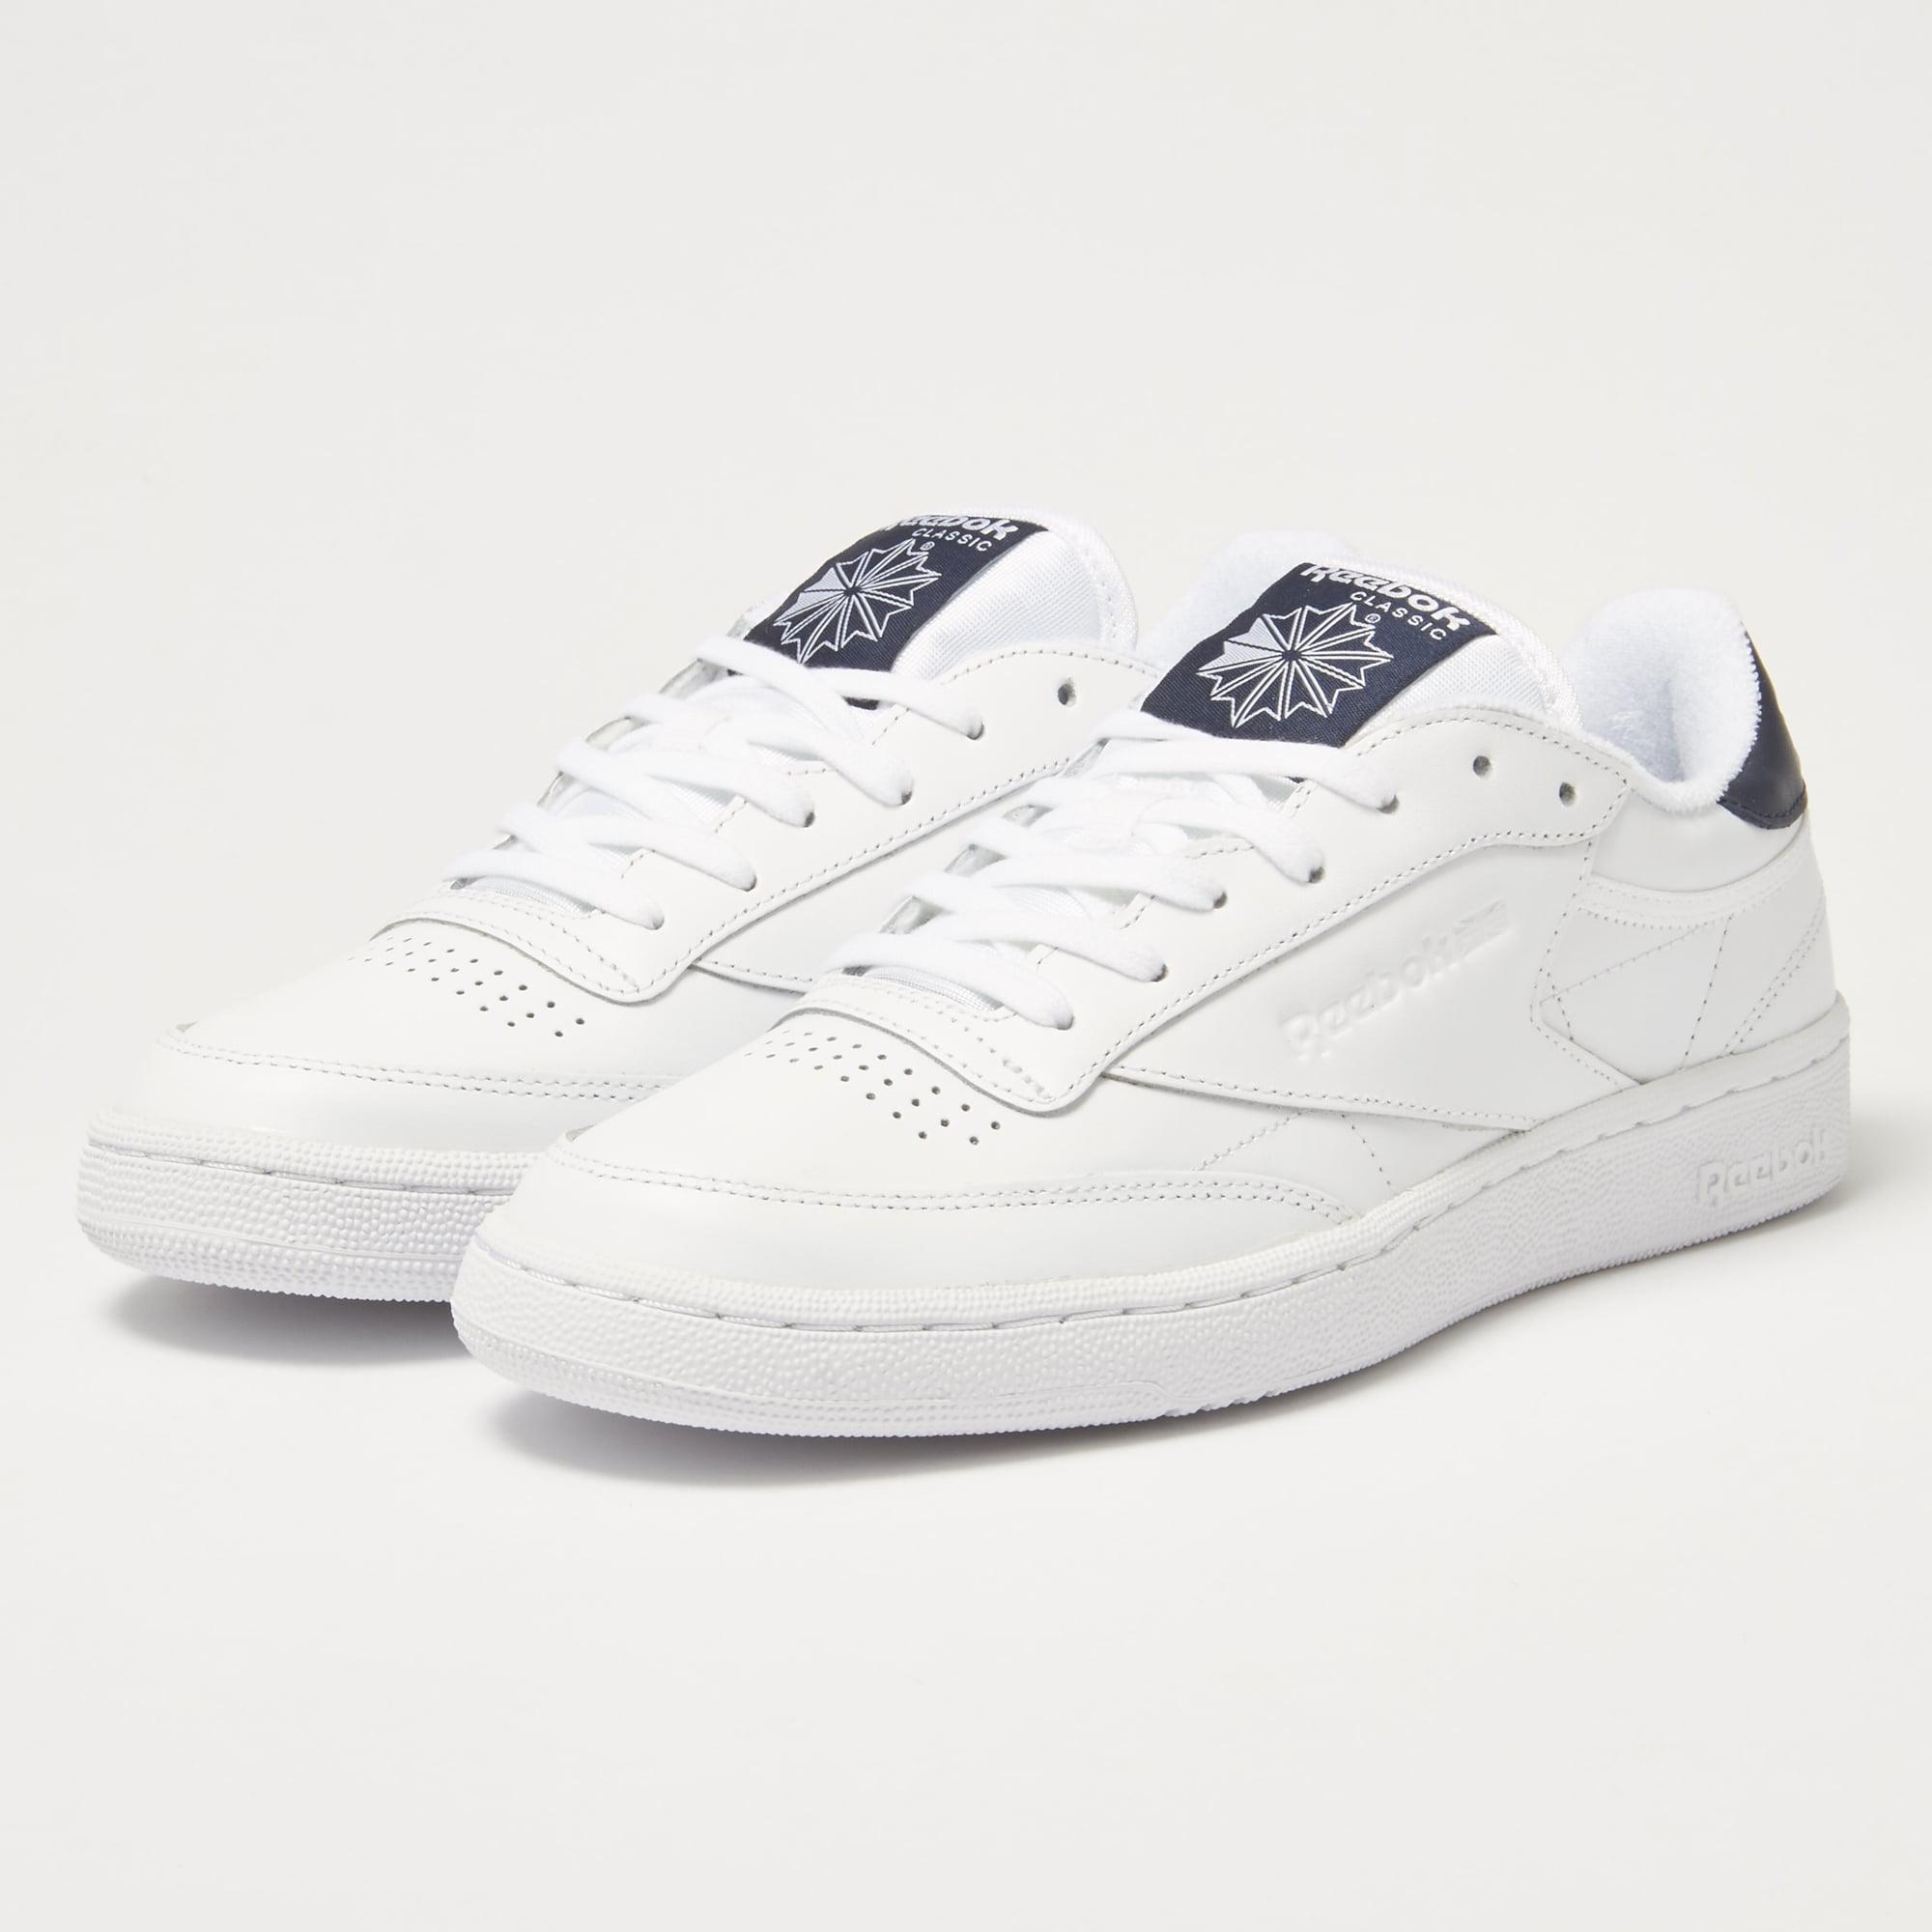 Abstand wählen Großhandelsverkauf moderner Stil Club C85 El White Sneakers Bd5688